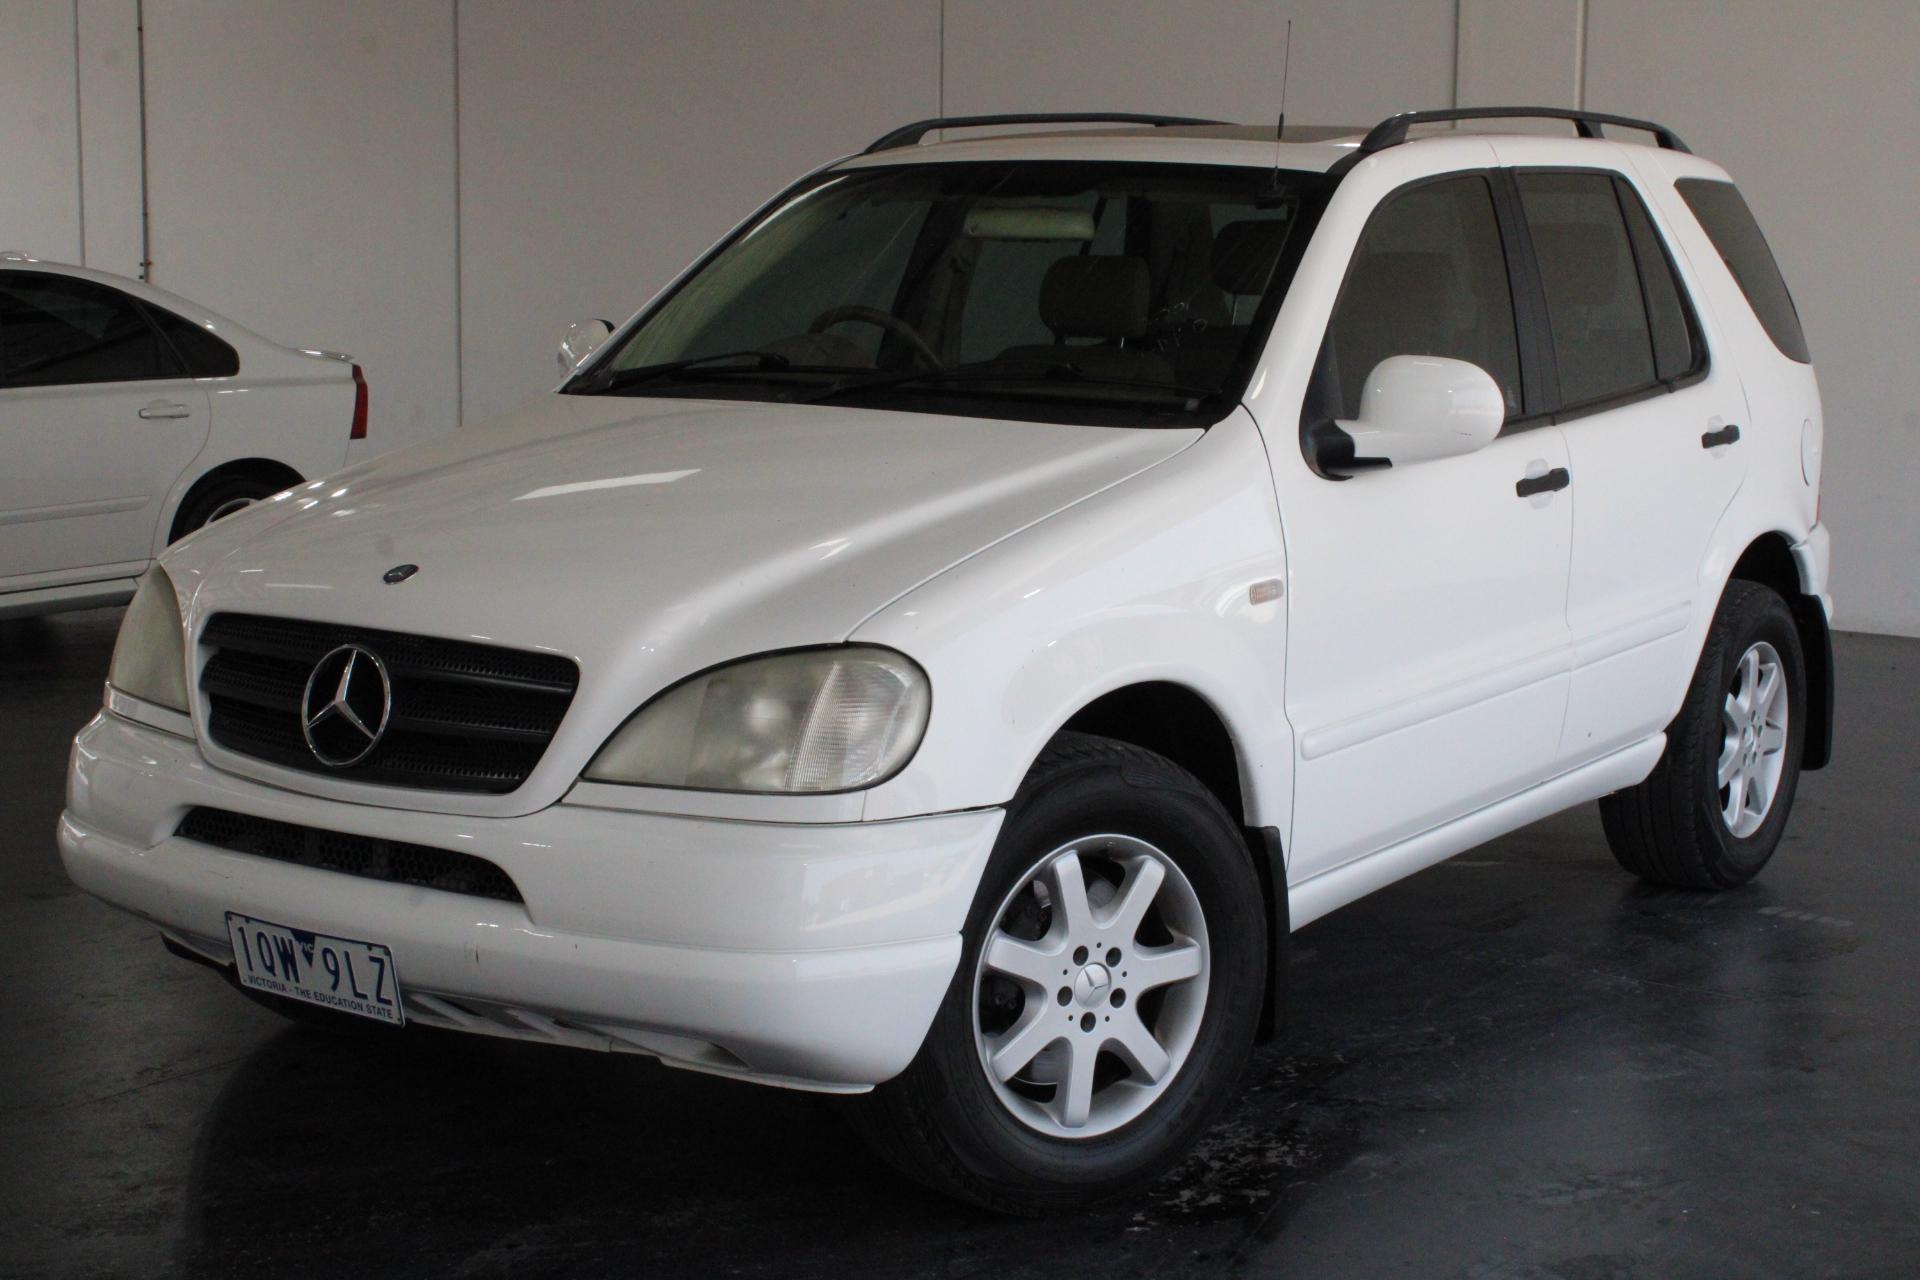 2001 Mercedes Benz ML 430 (4x4) W163 Automatic Wagon